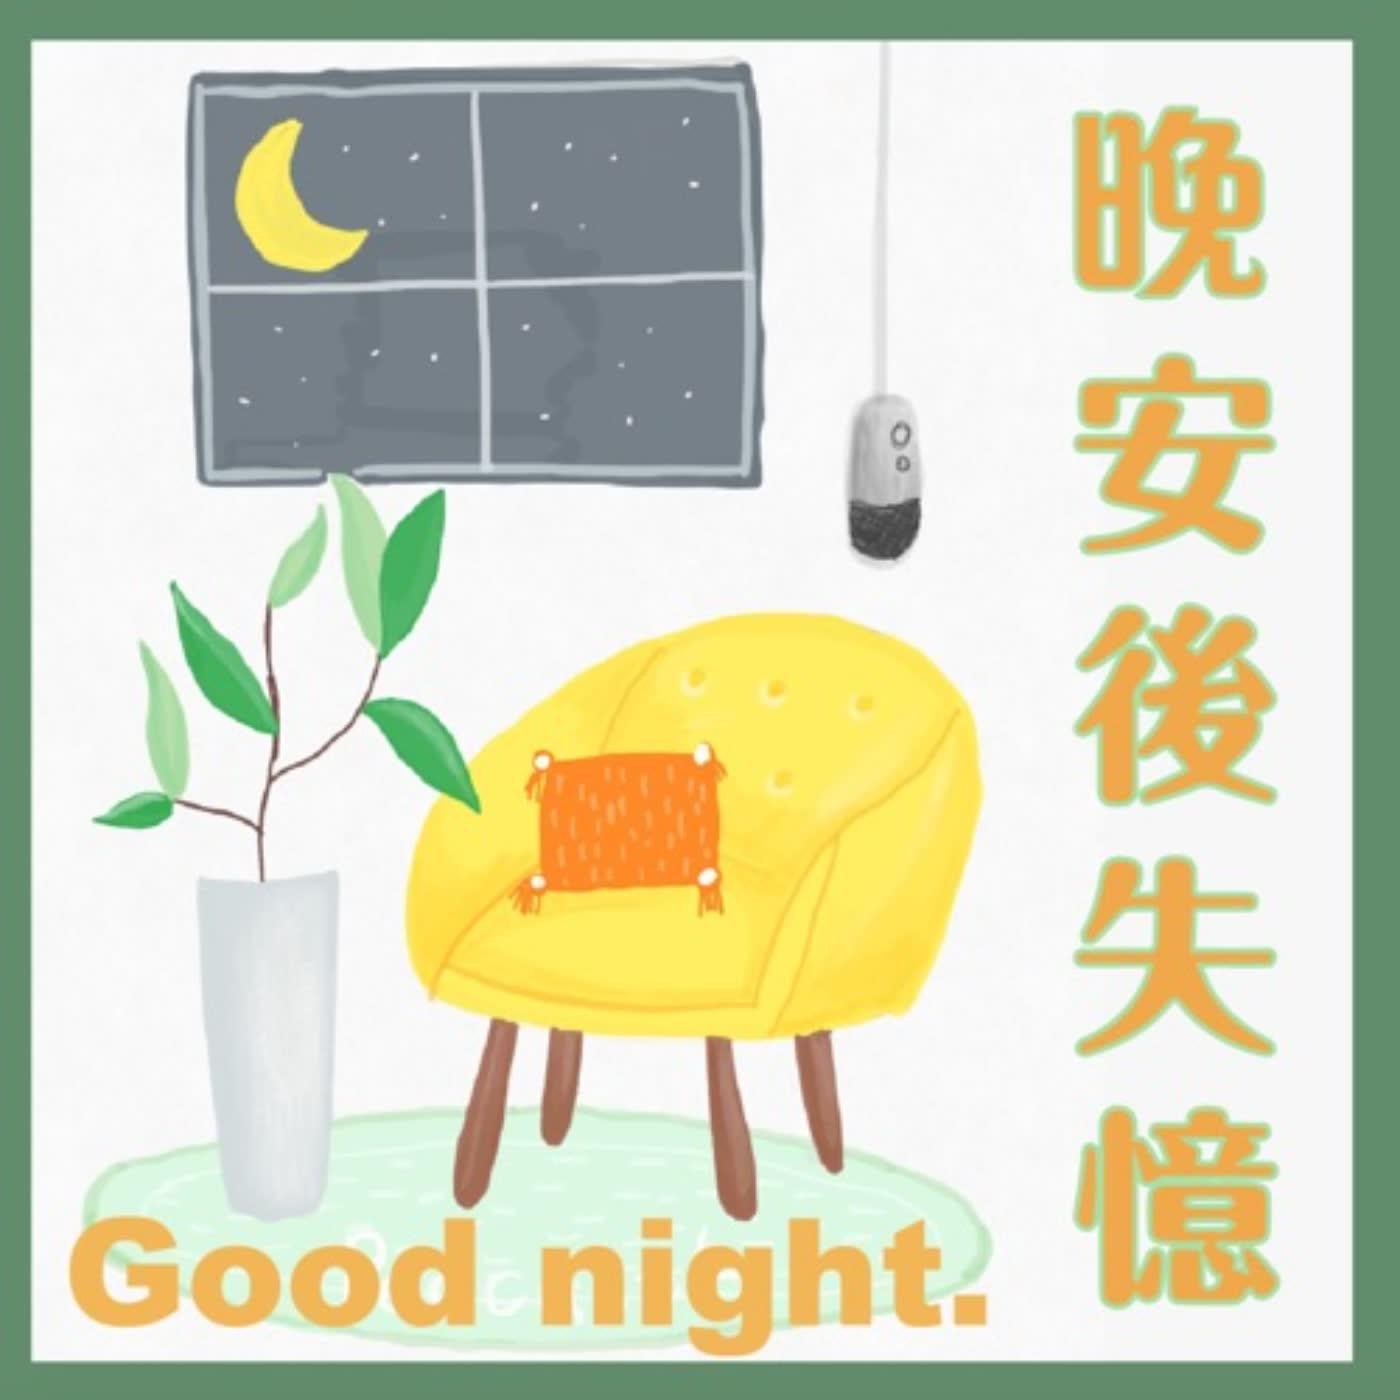 晚安後失憶。